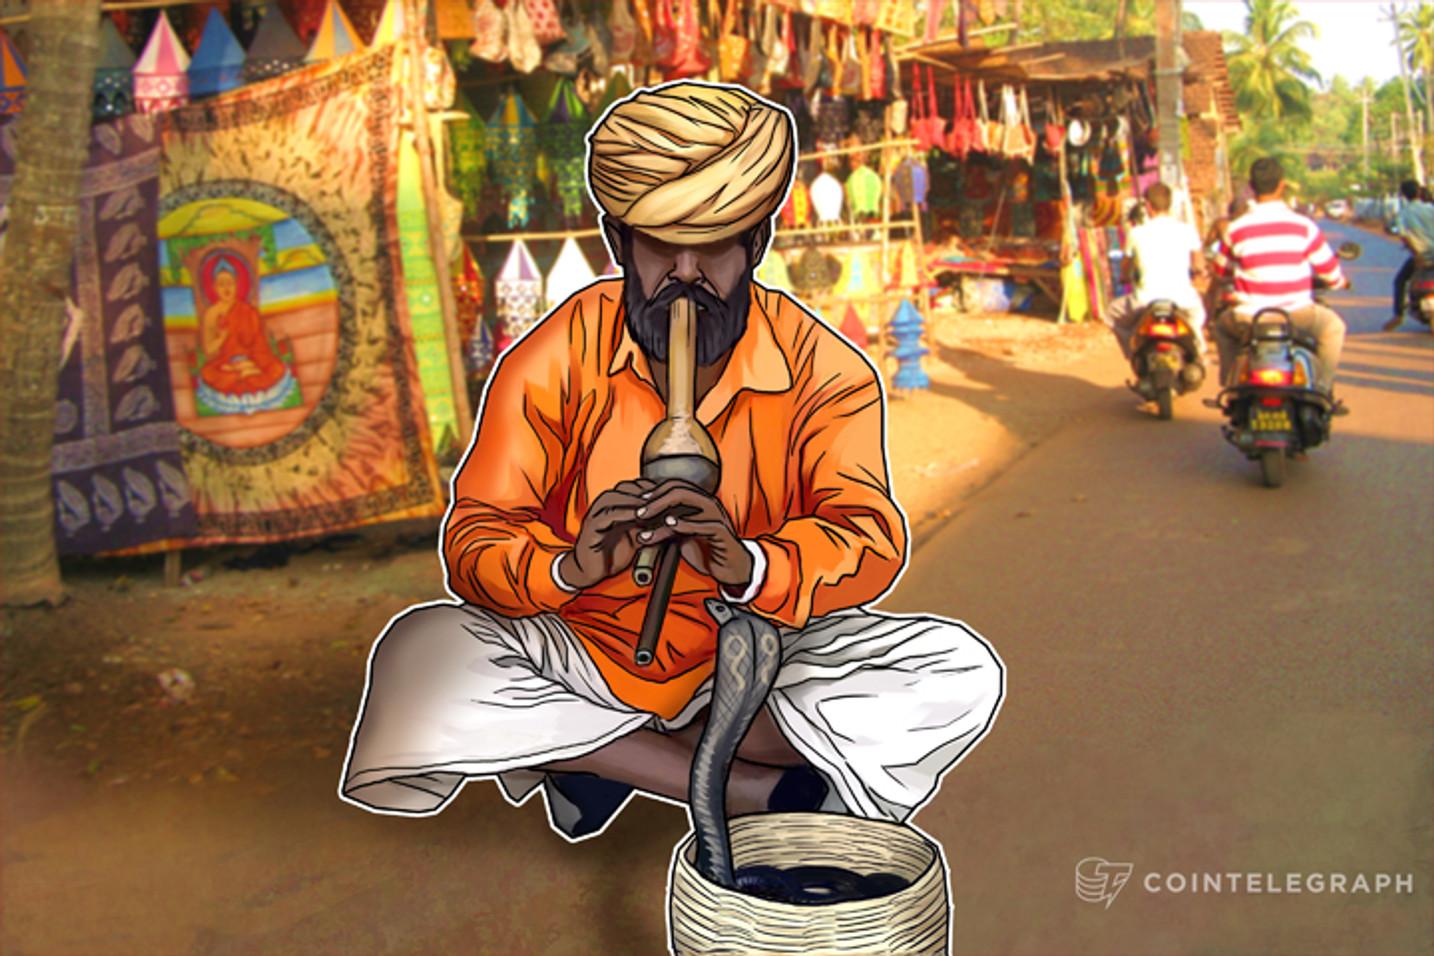 Bitcoin Ponzi Scheme? Indian Government Seem to Disagree With Claim